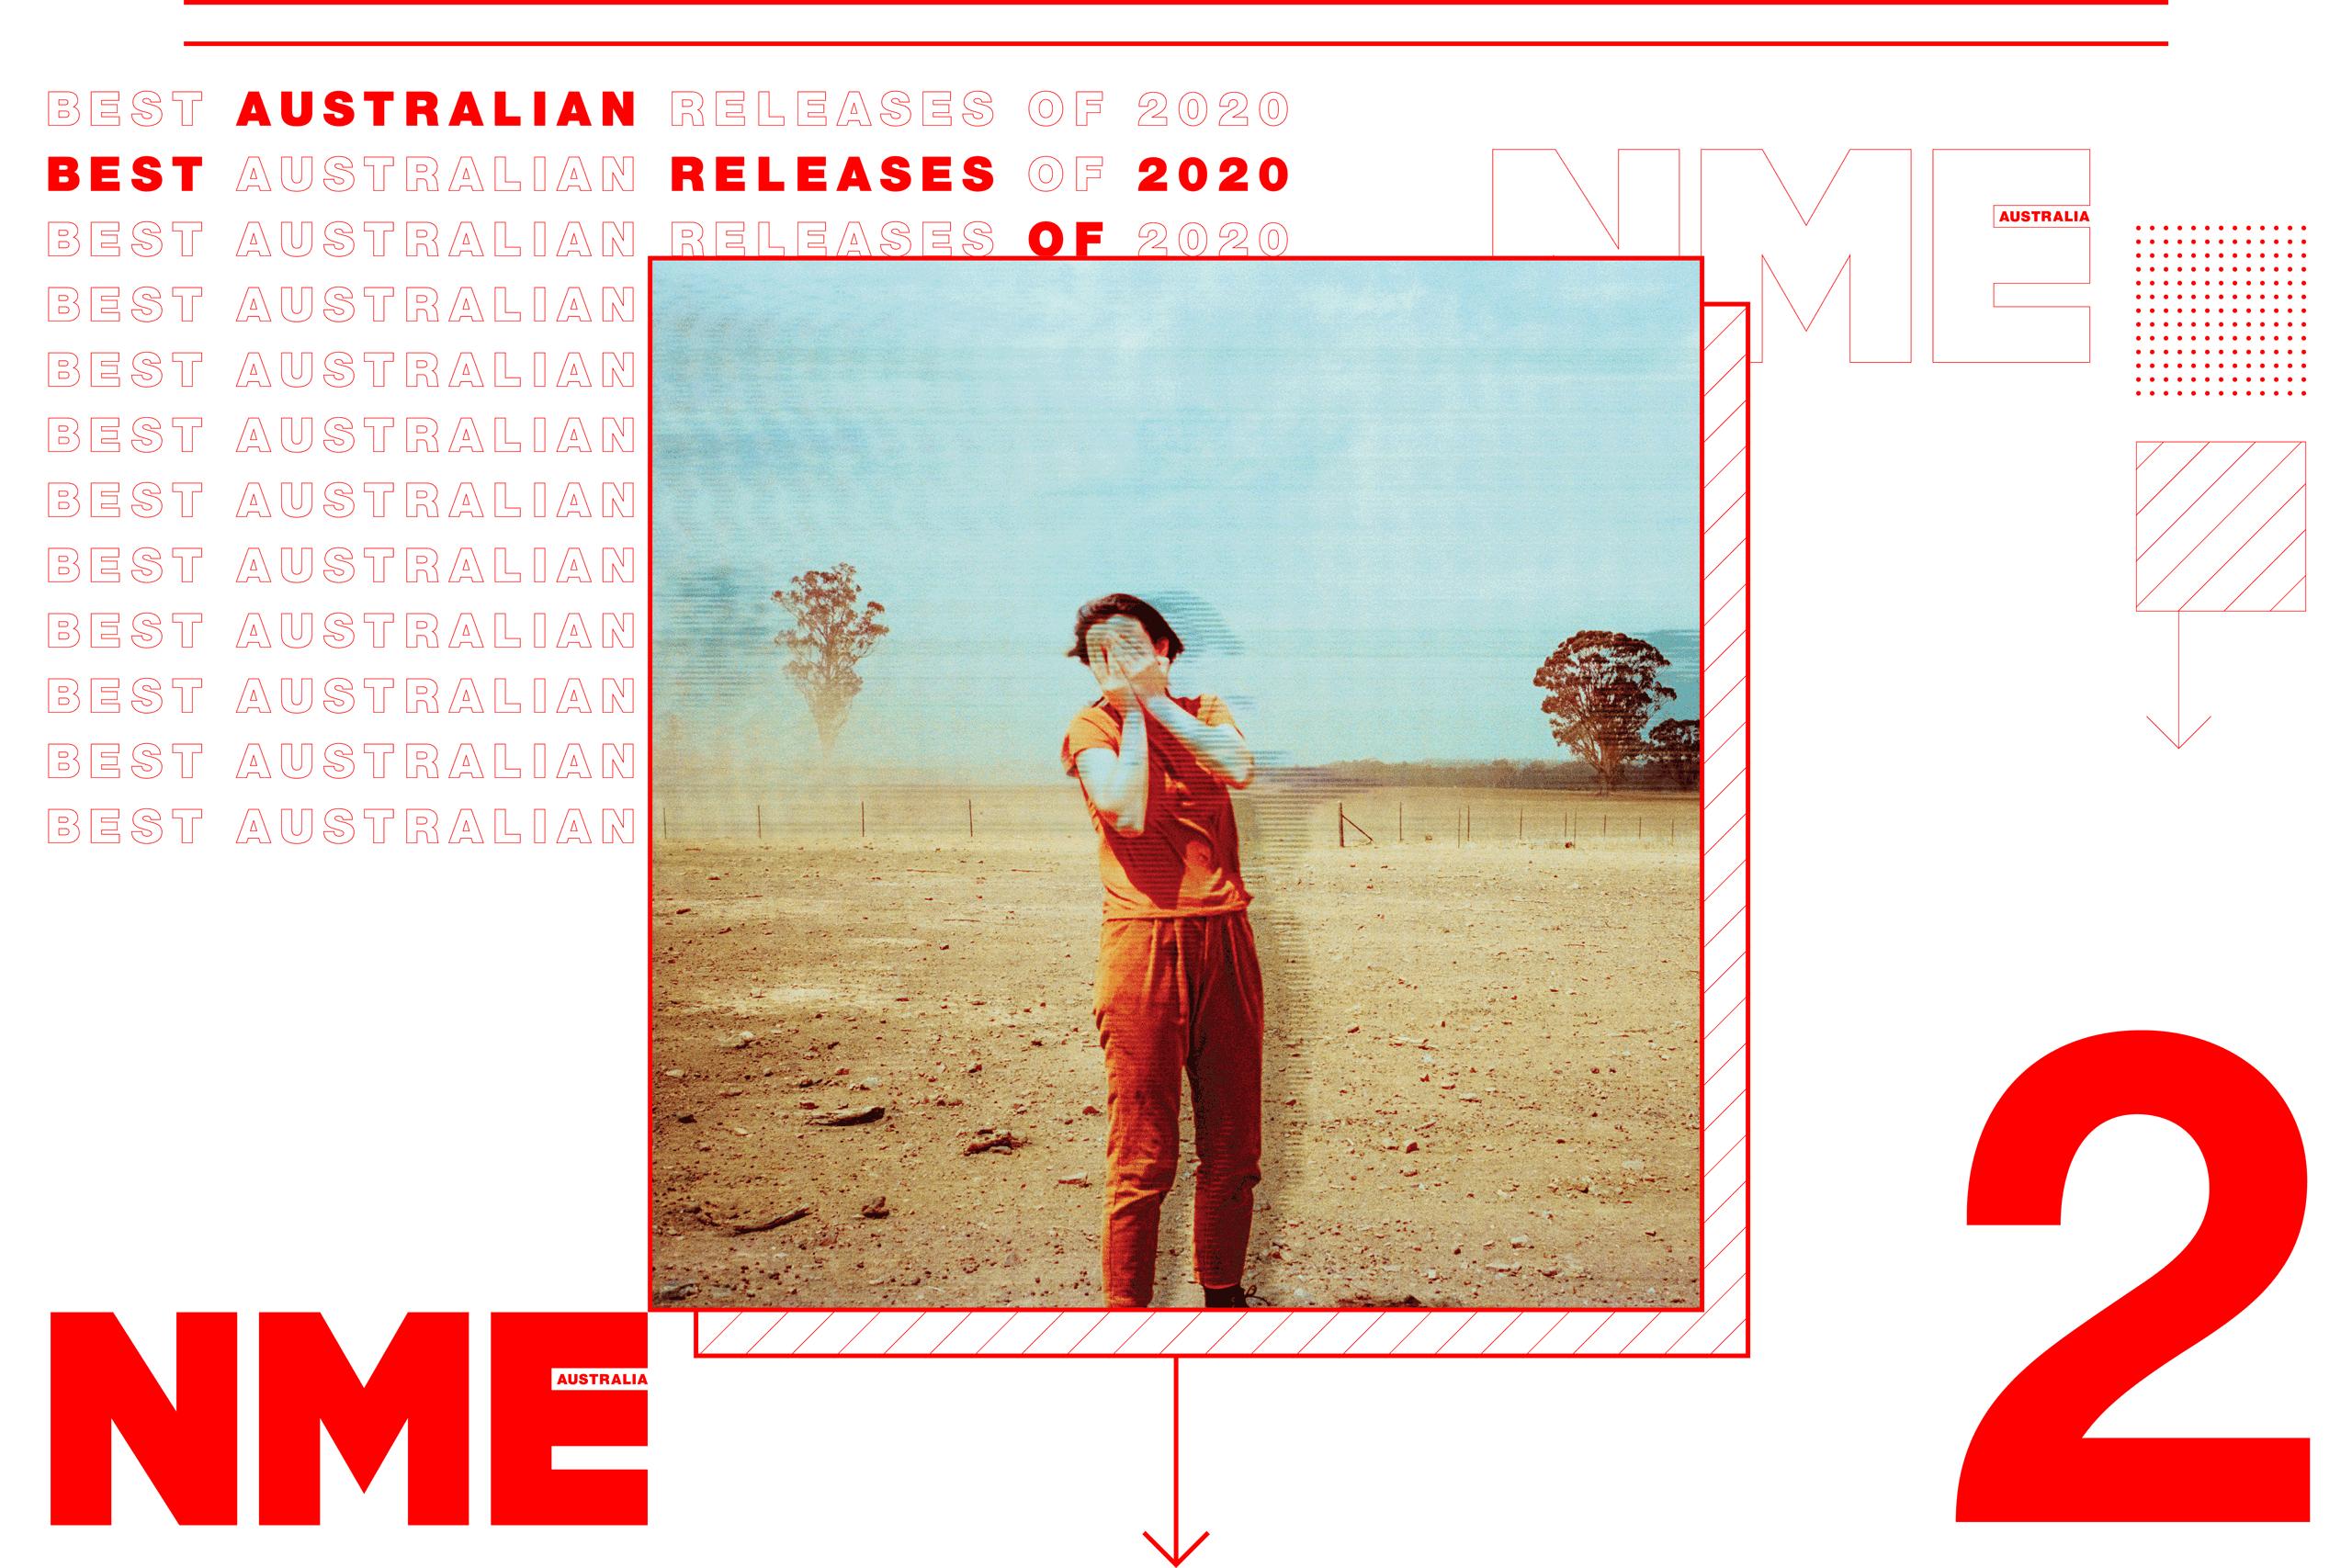 NME Australian Album Release 2